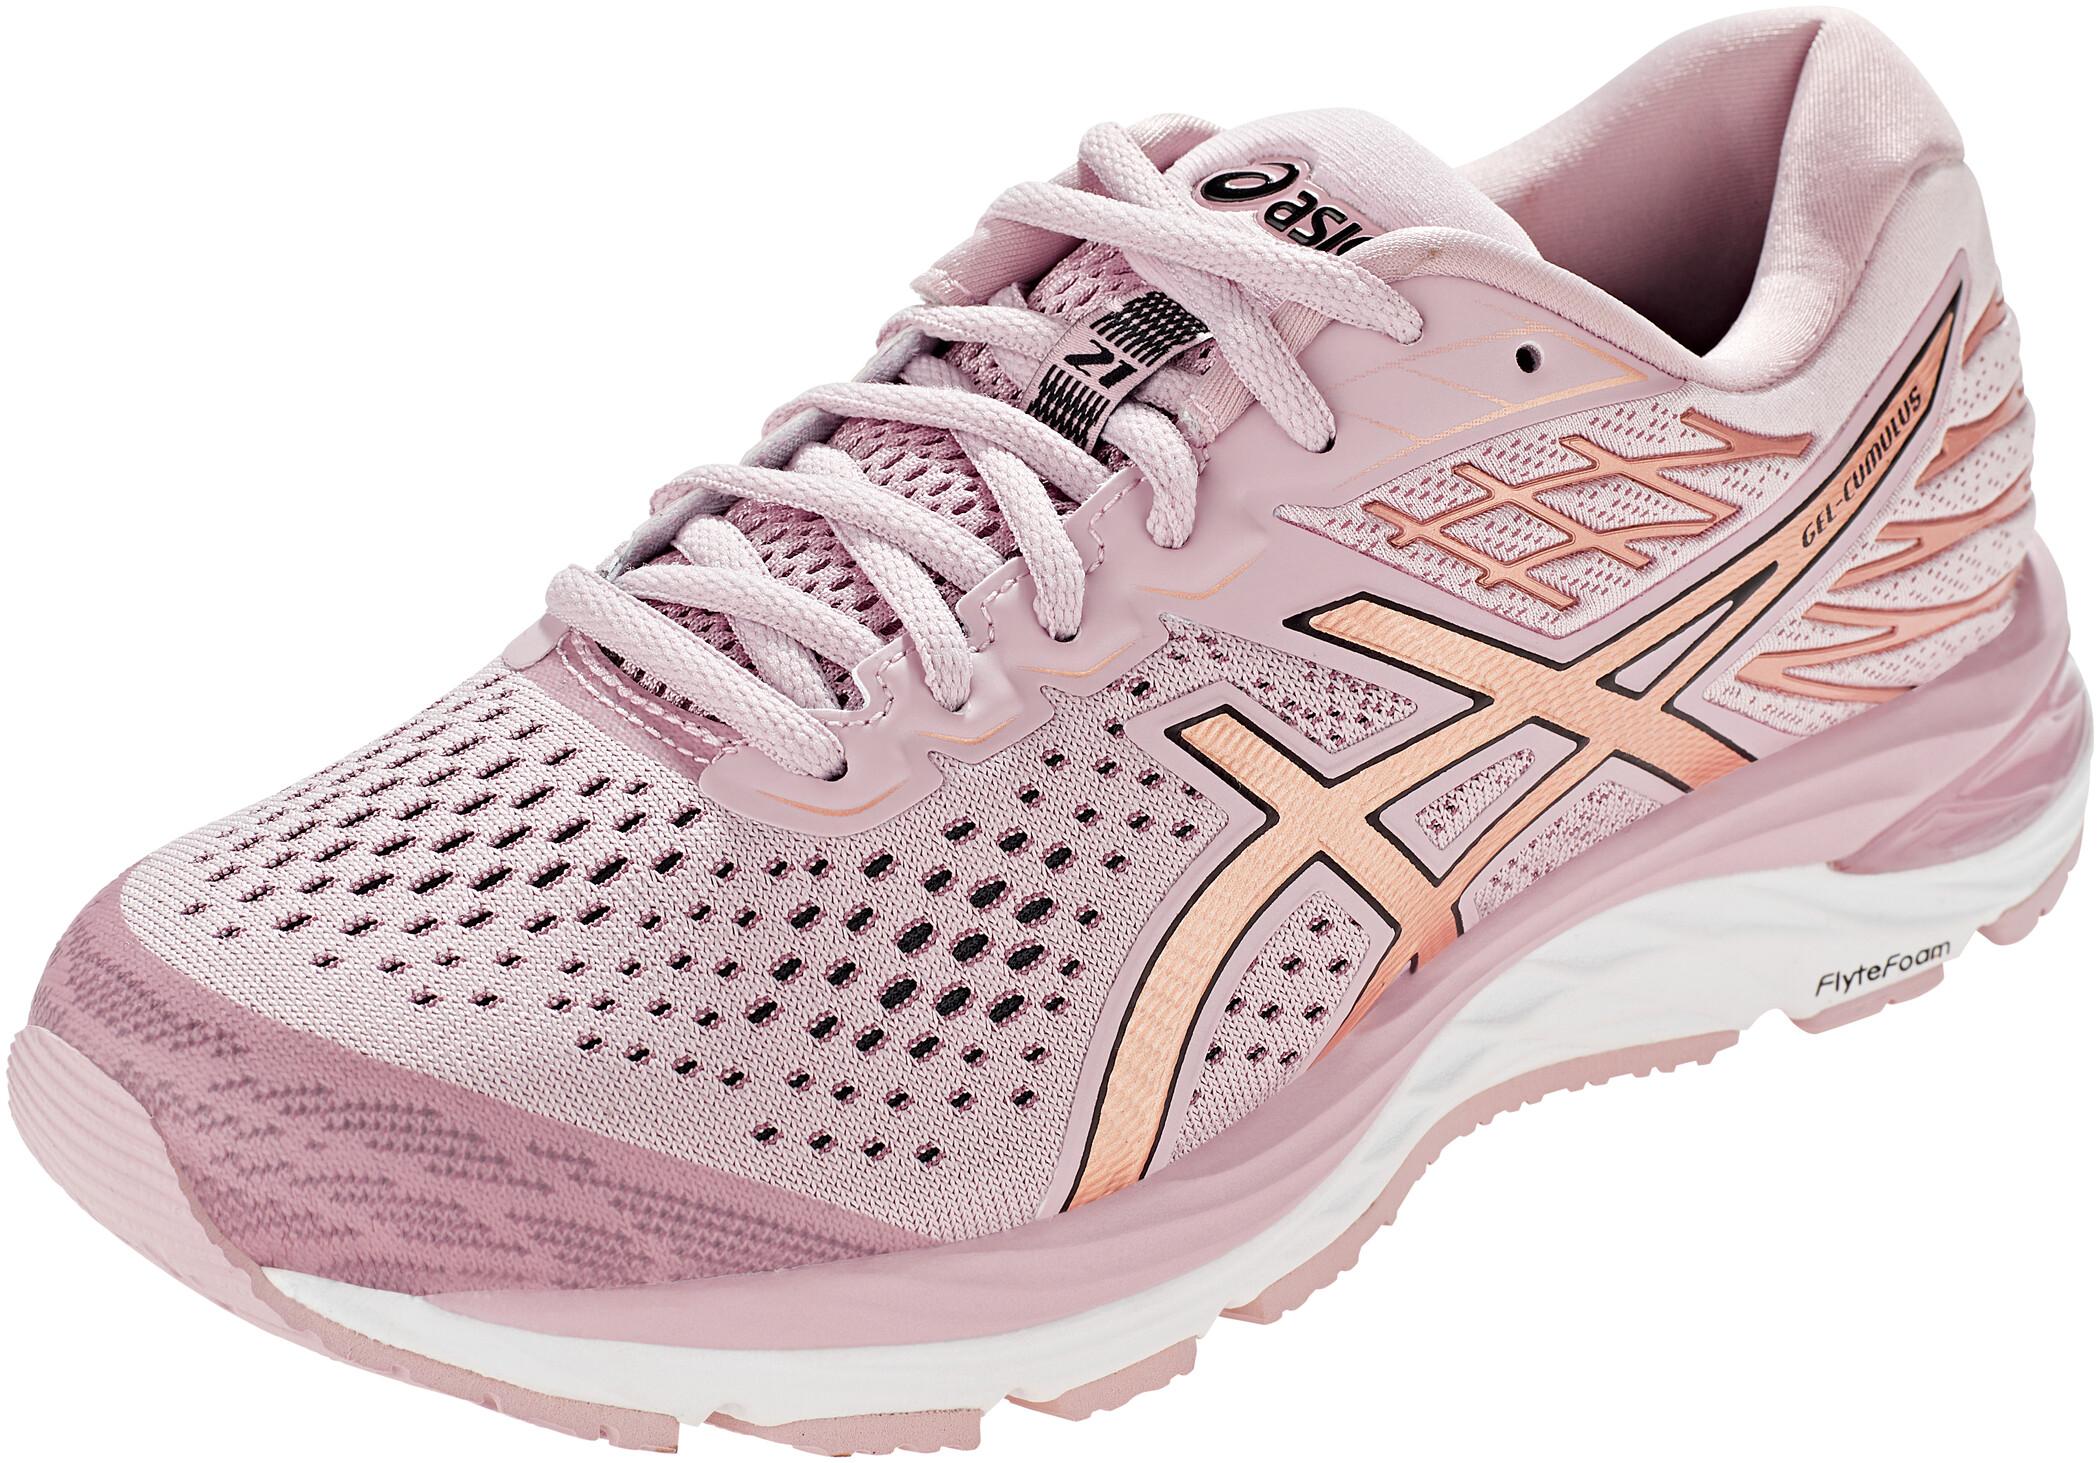 asics Dynaflyte 4 Shoes Women flash coralwhite